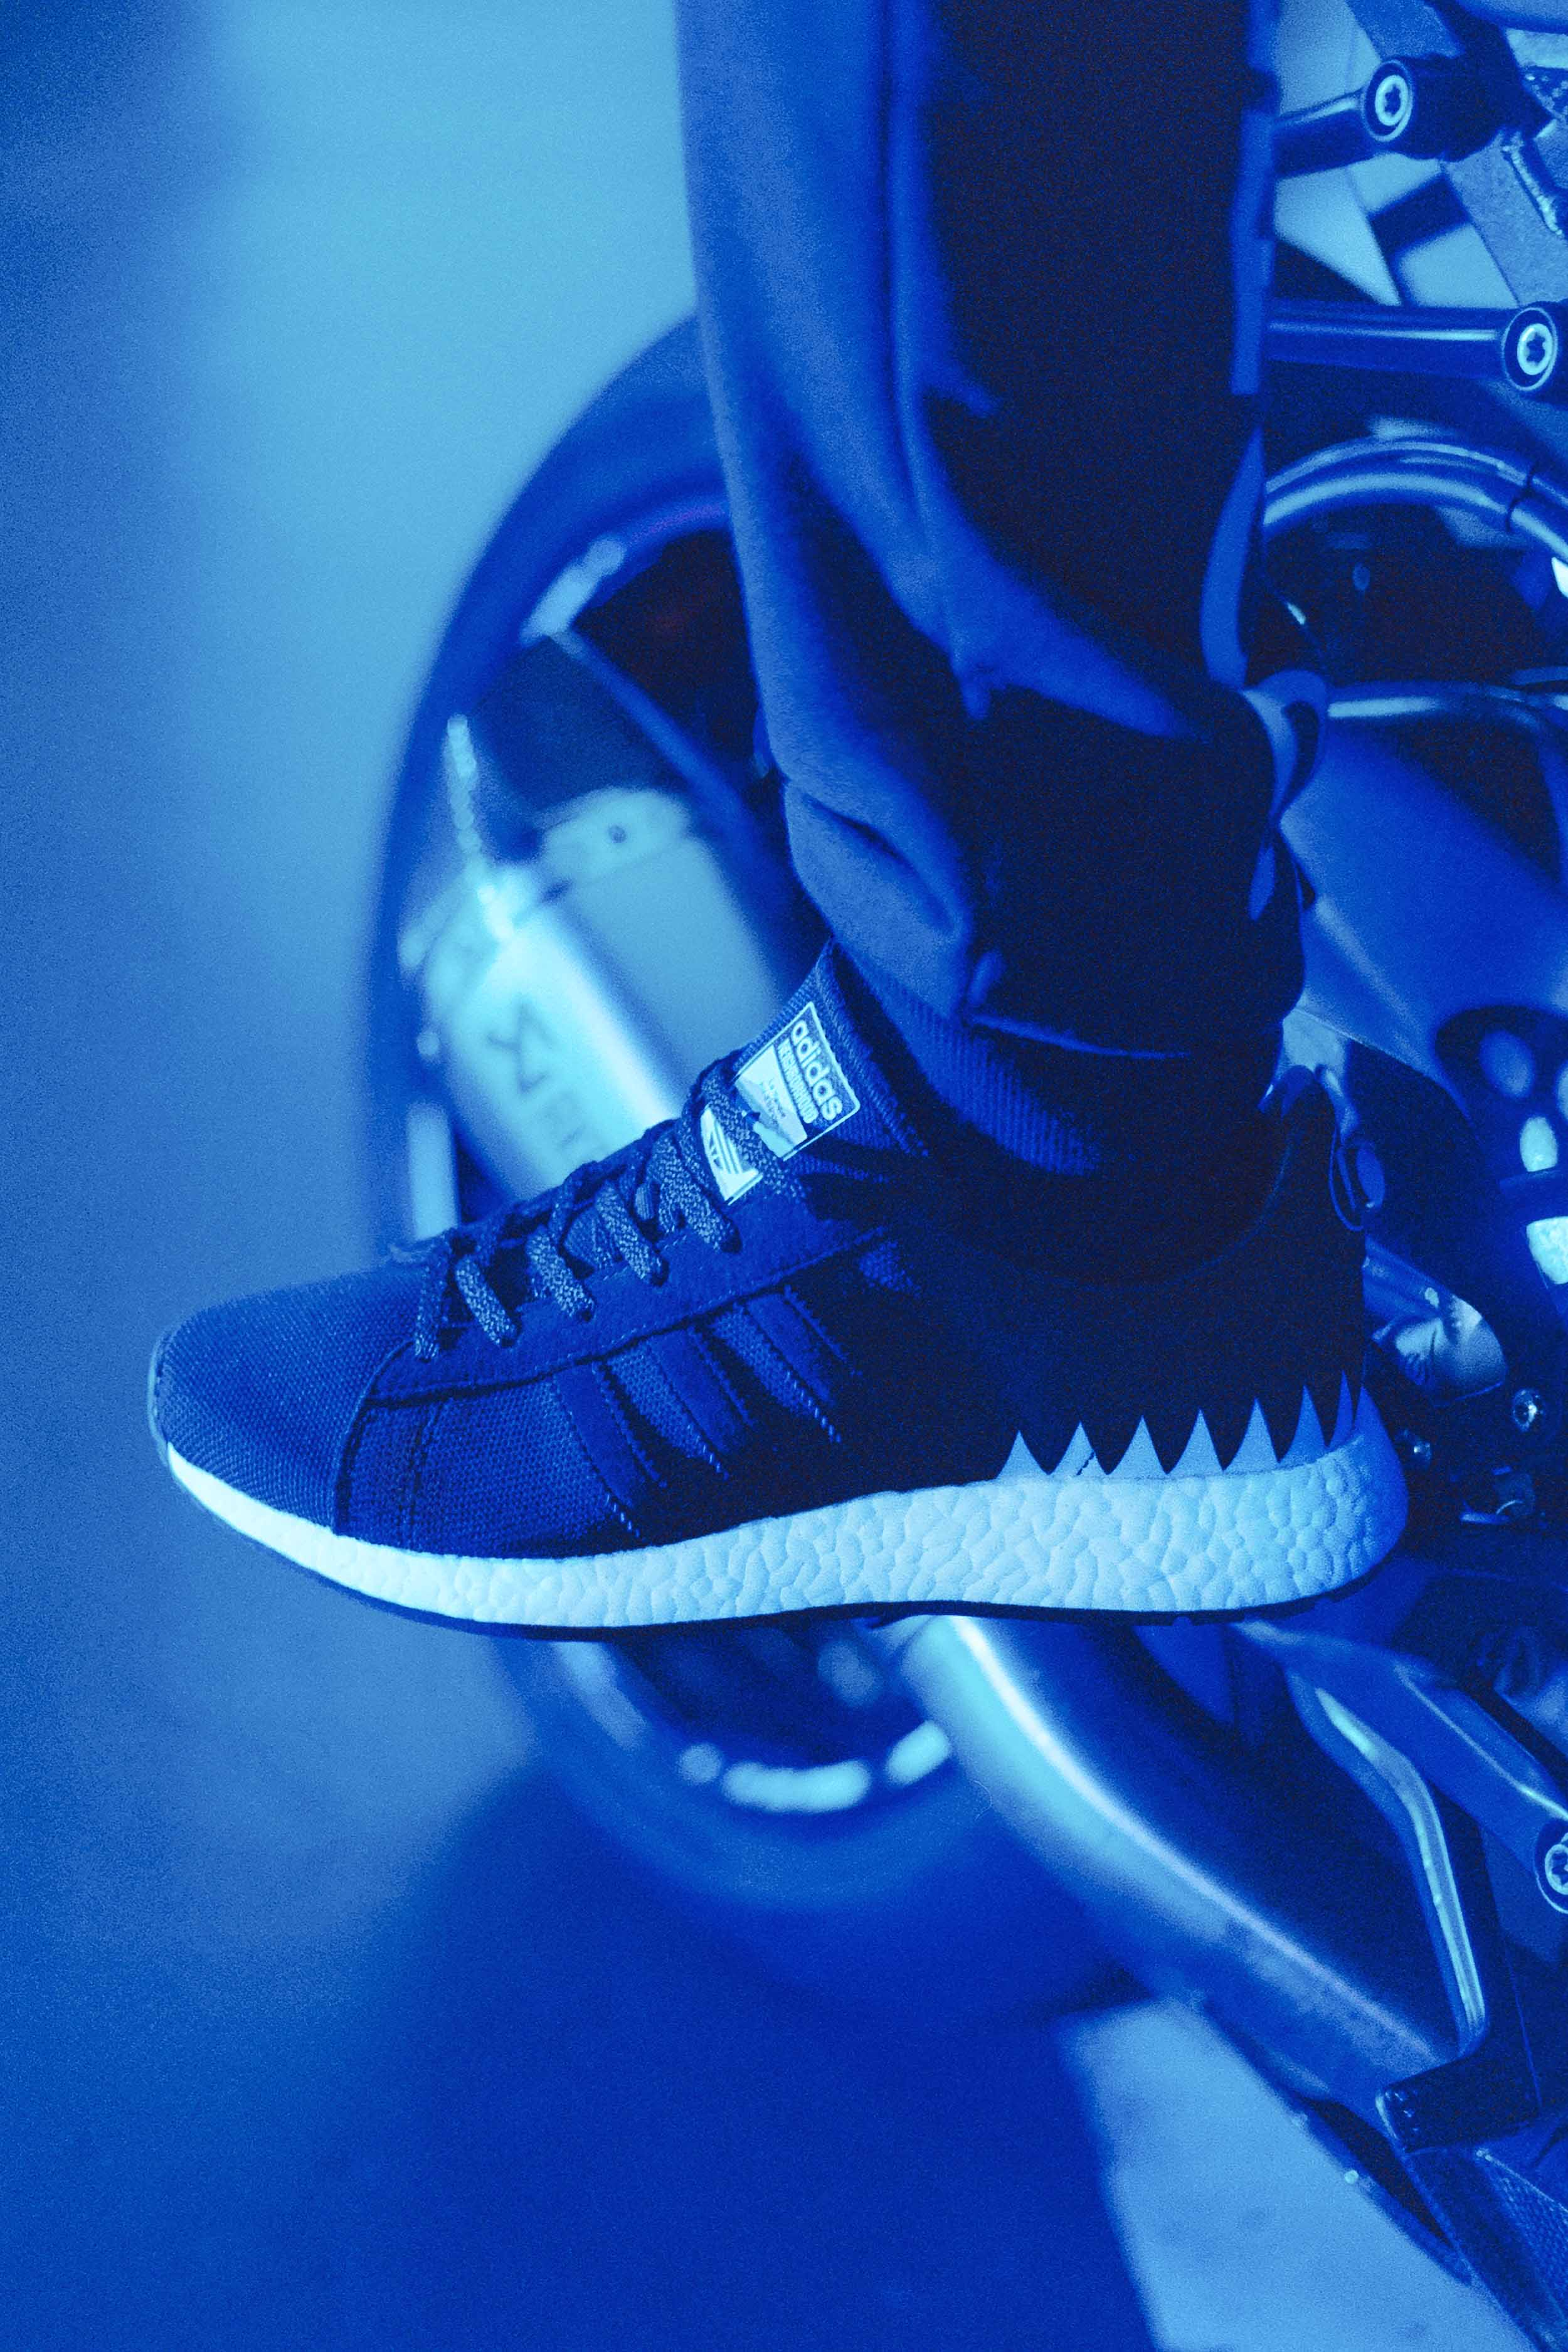 adidas-Originals-by-NBHD_09